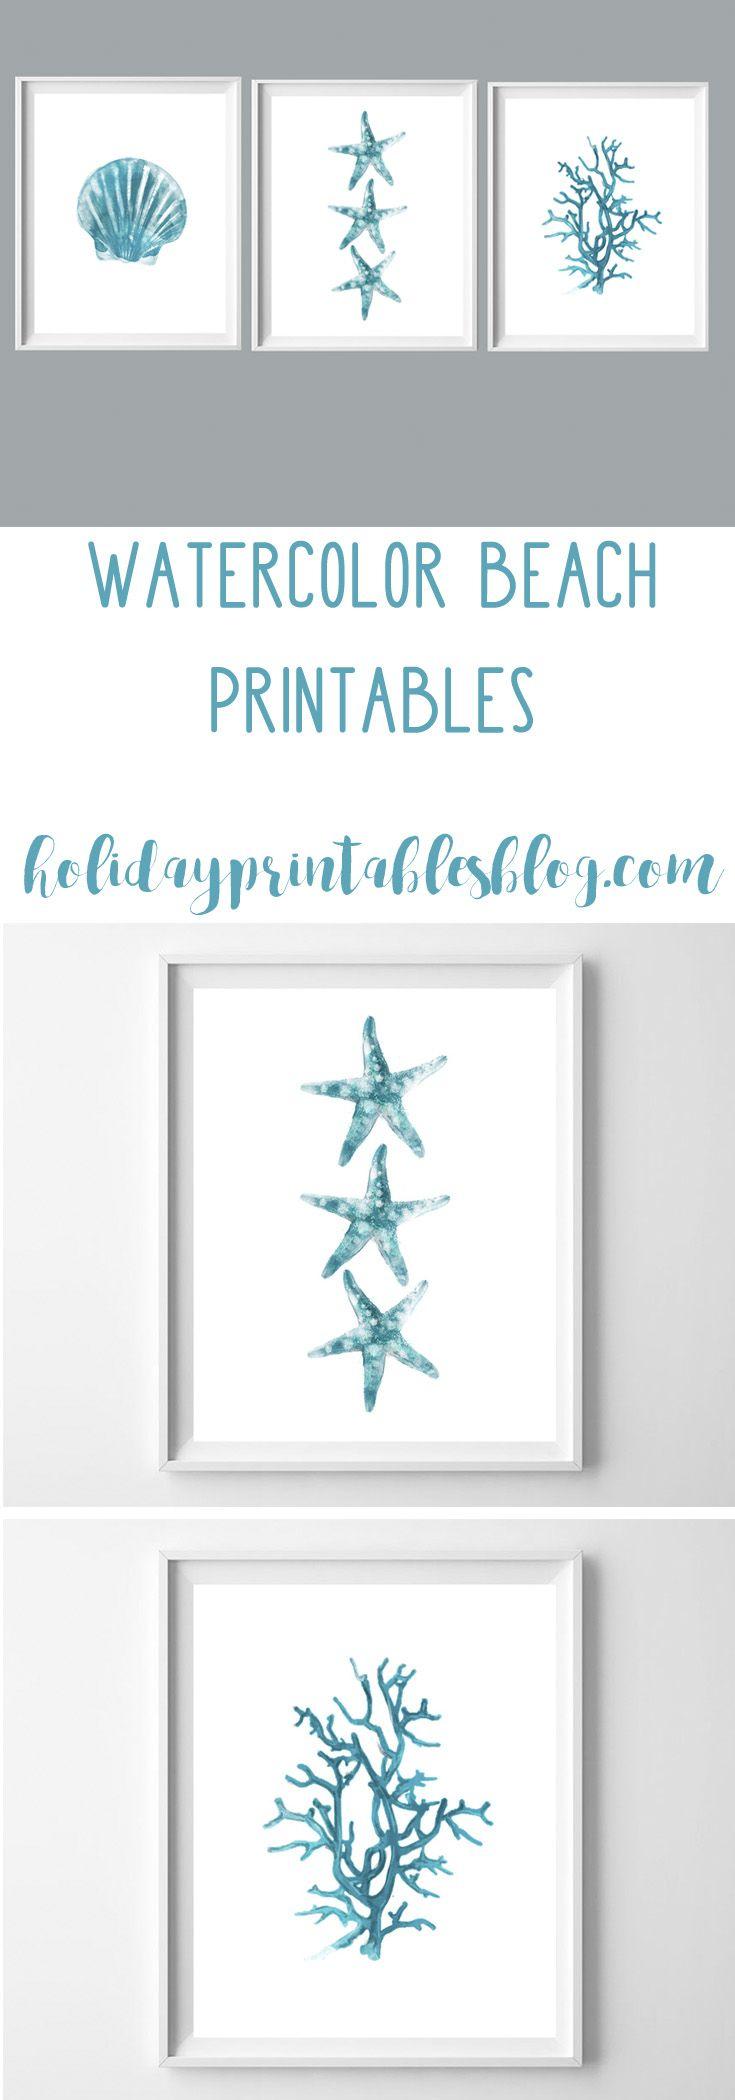 Bathroom wall art printables - Watercolor Beach Printables Free Printable Art Beach House Coastal Decor Teal Art